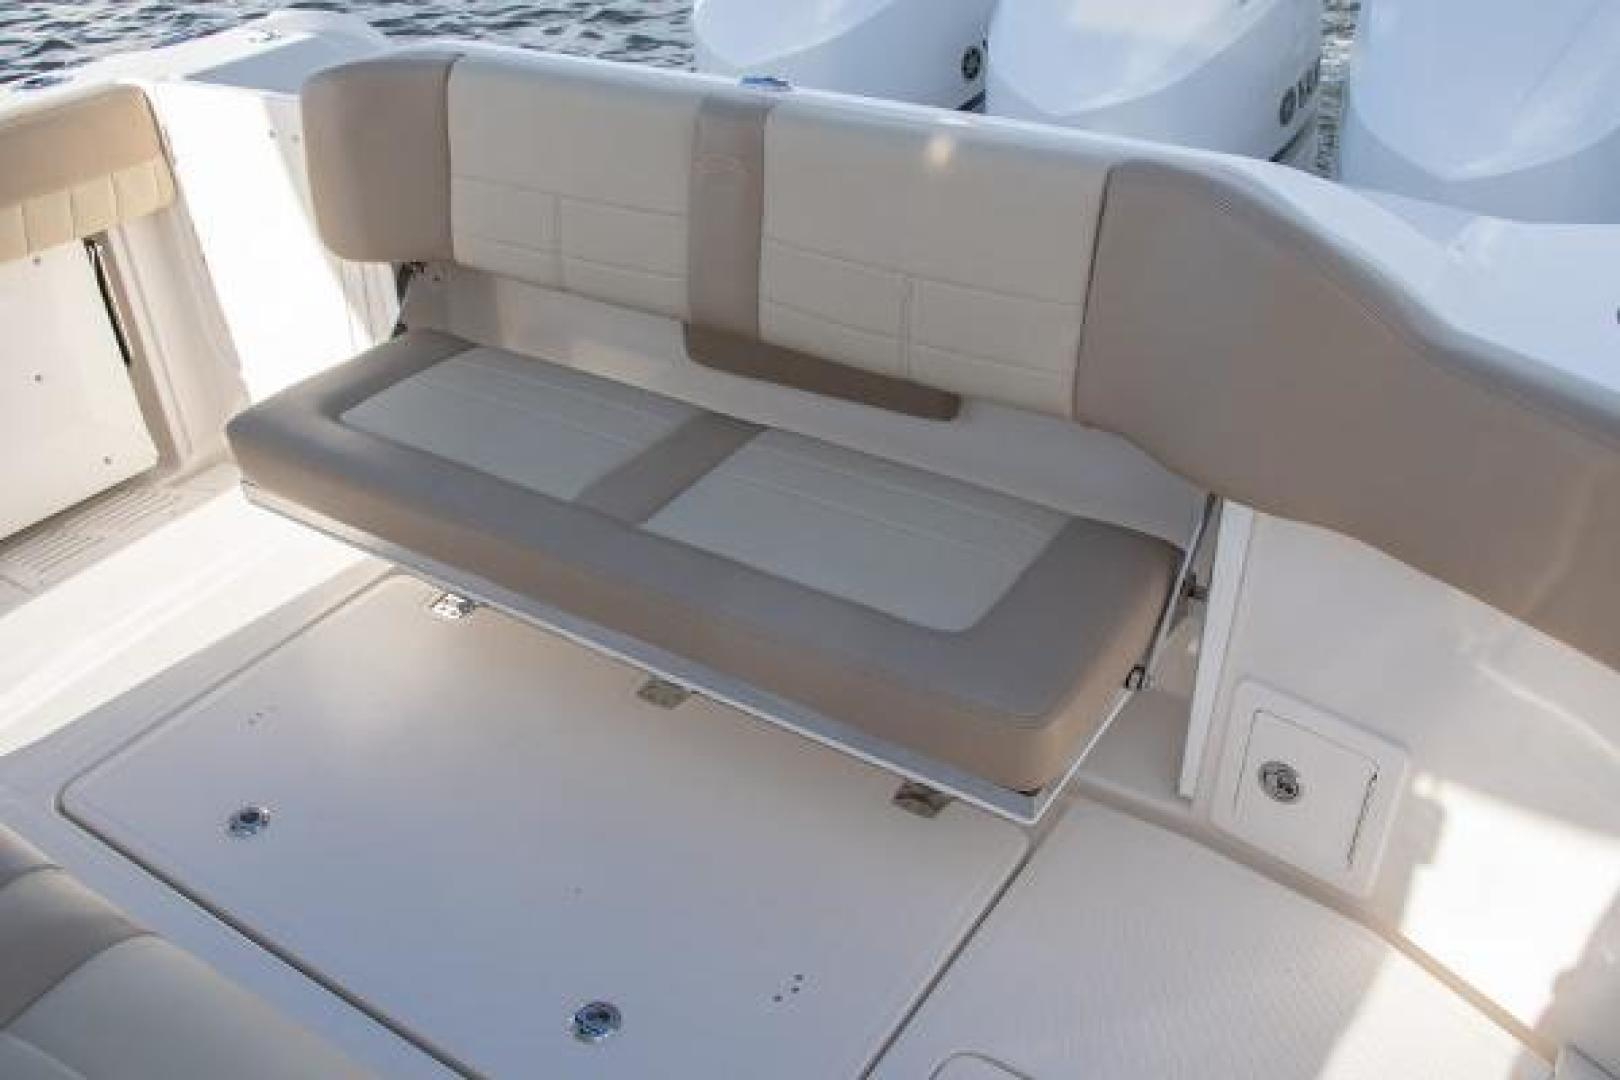 Sailfish-360 CC 2021-Sailfish 360 CC Fort Lauderdale-Florida-United States-Manufacturer Provided Image-1524514 | Thumbnail